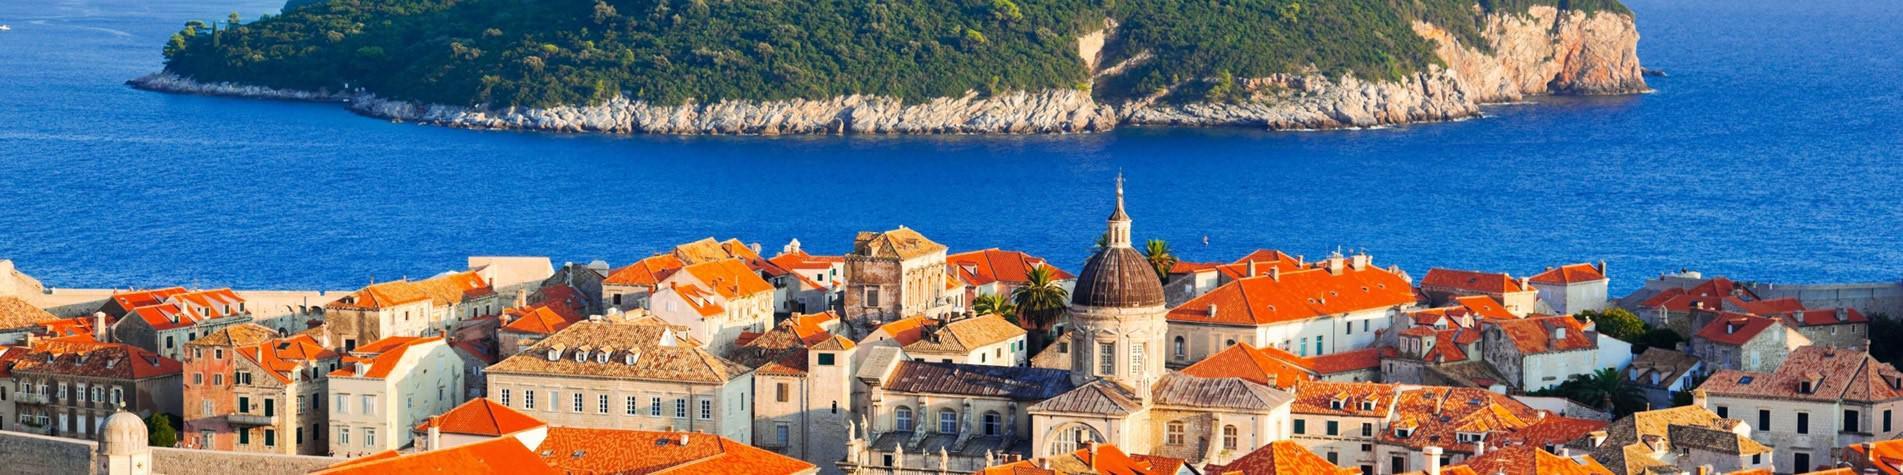 Dubrovnik Holidays Specialists